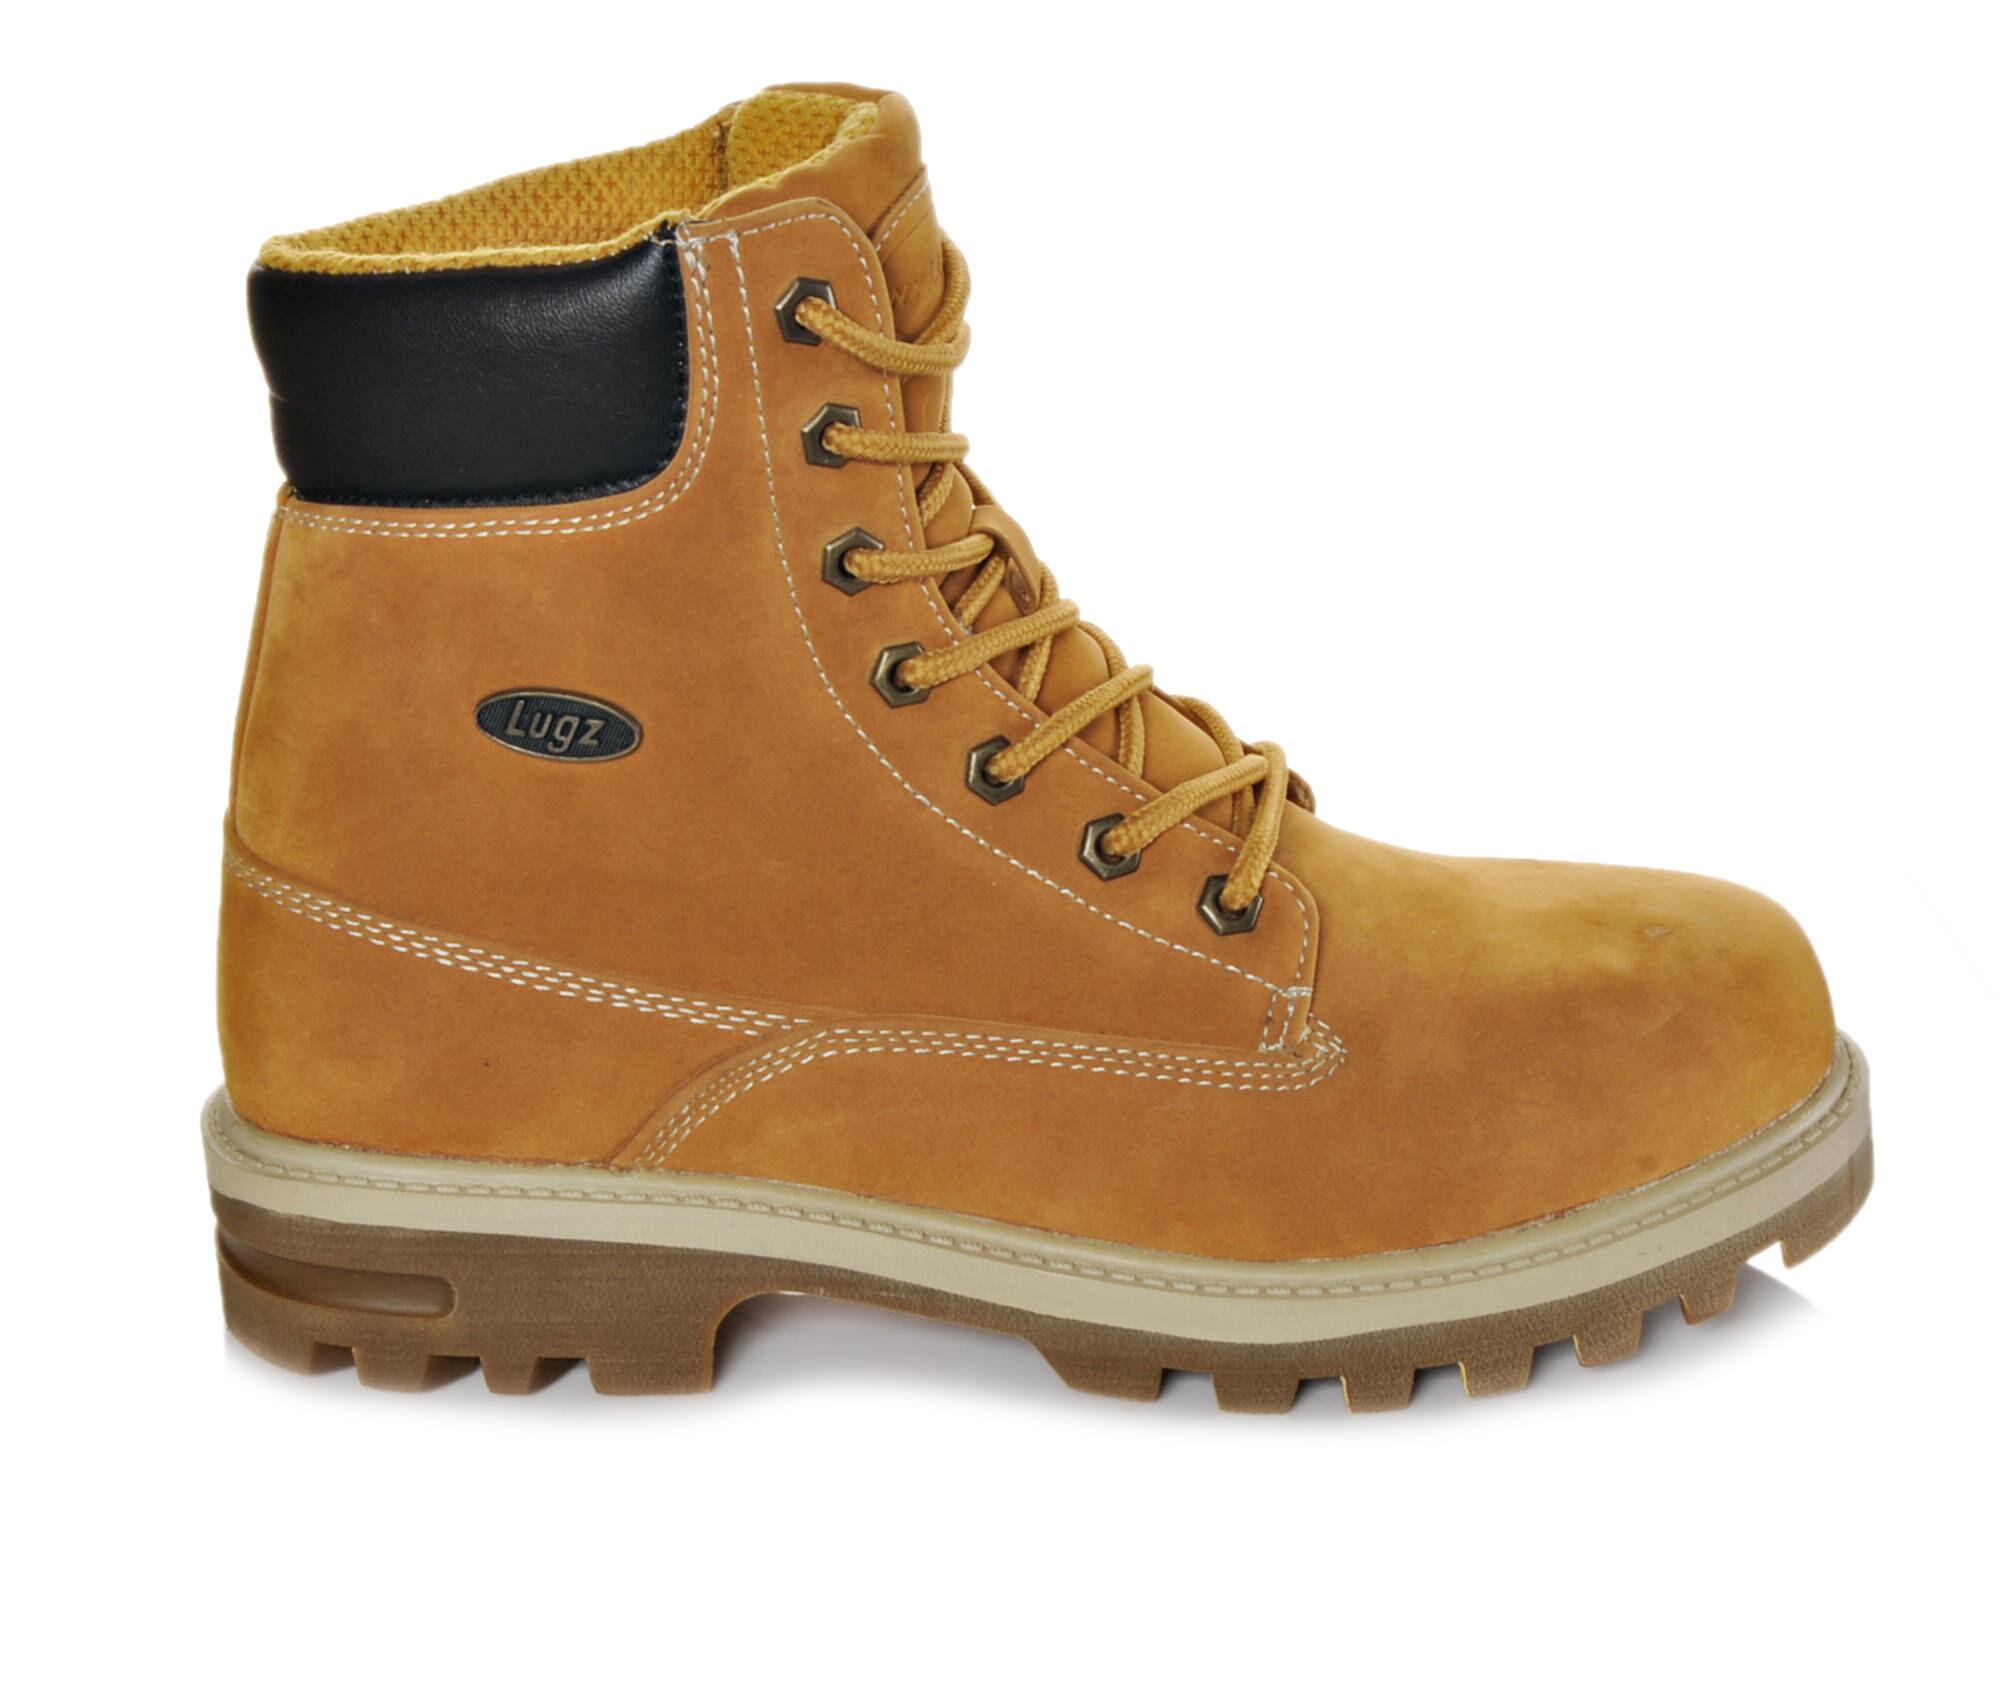 Men's Lugz Empire Hi Water Resistant Boots Golden Wheat